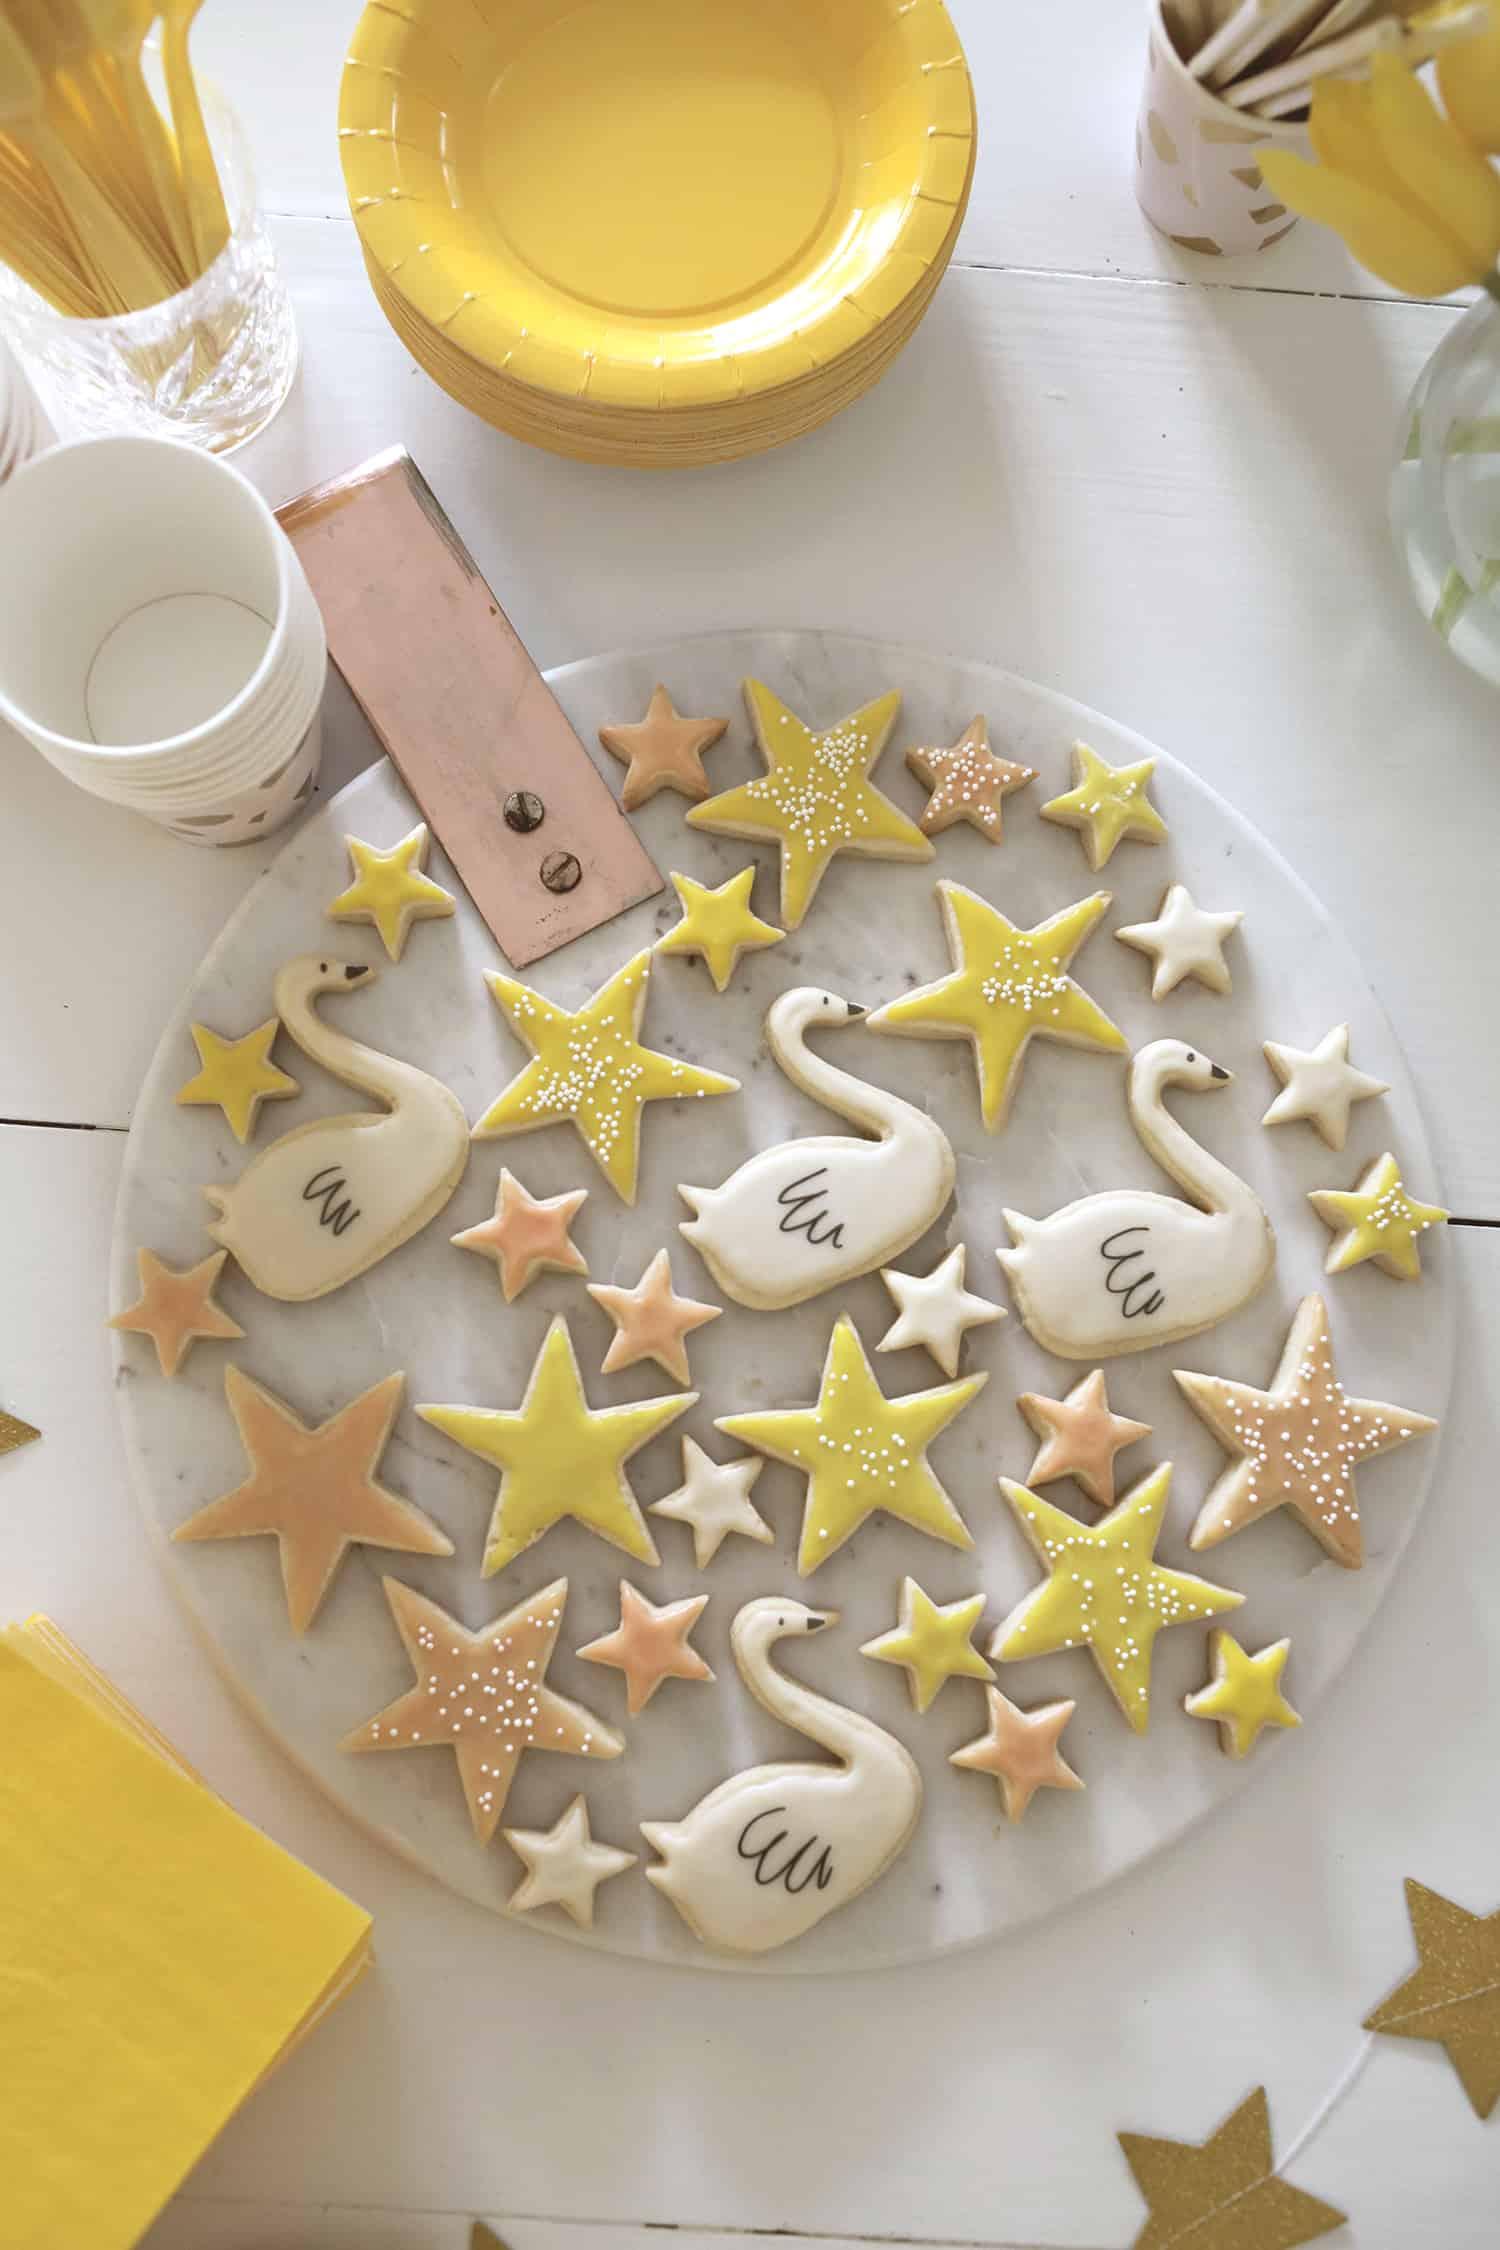 Nova's Star-Themed Birthday Party!